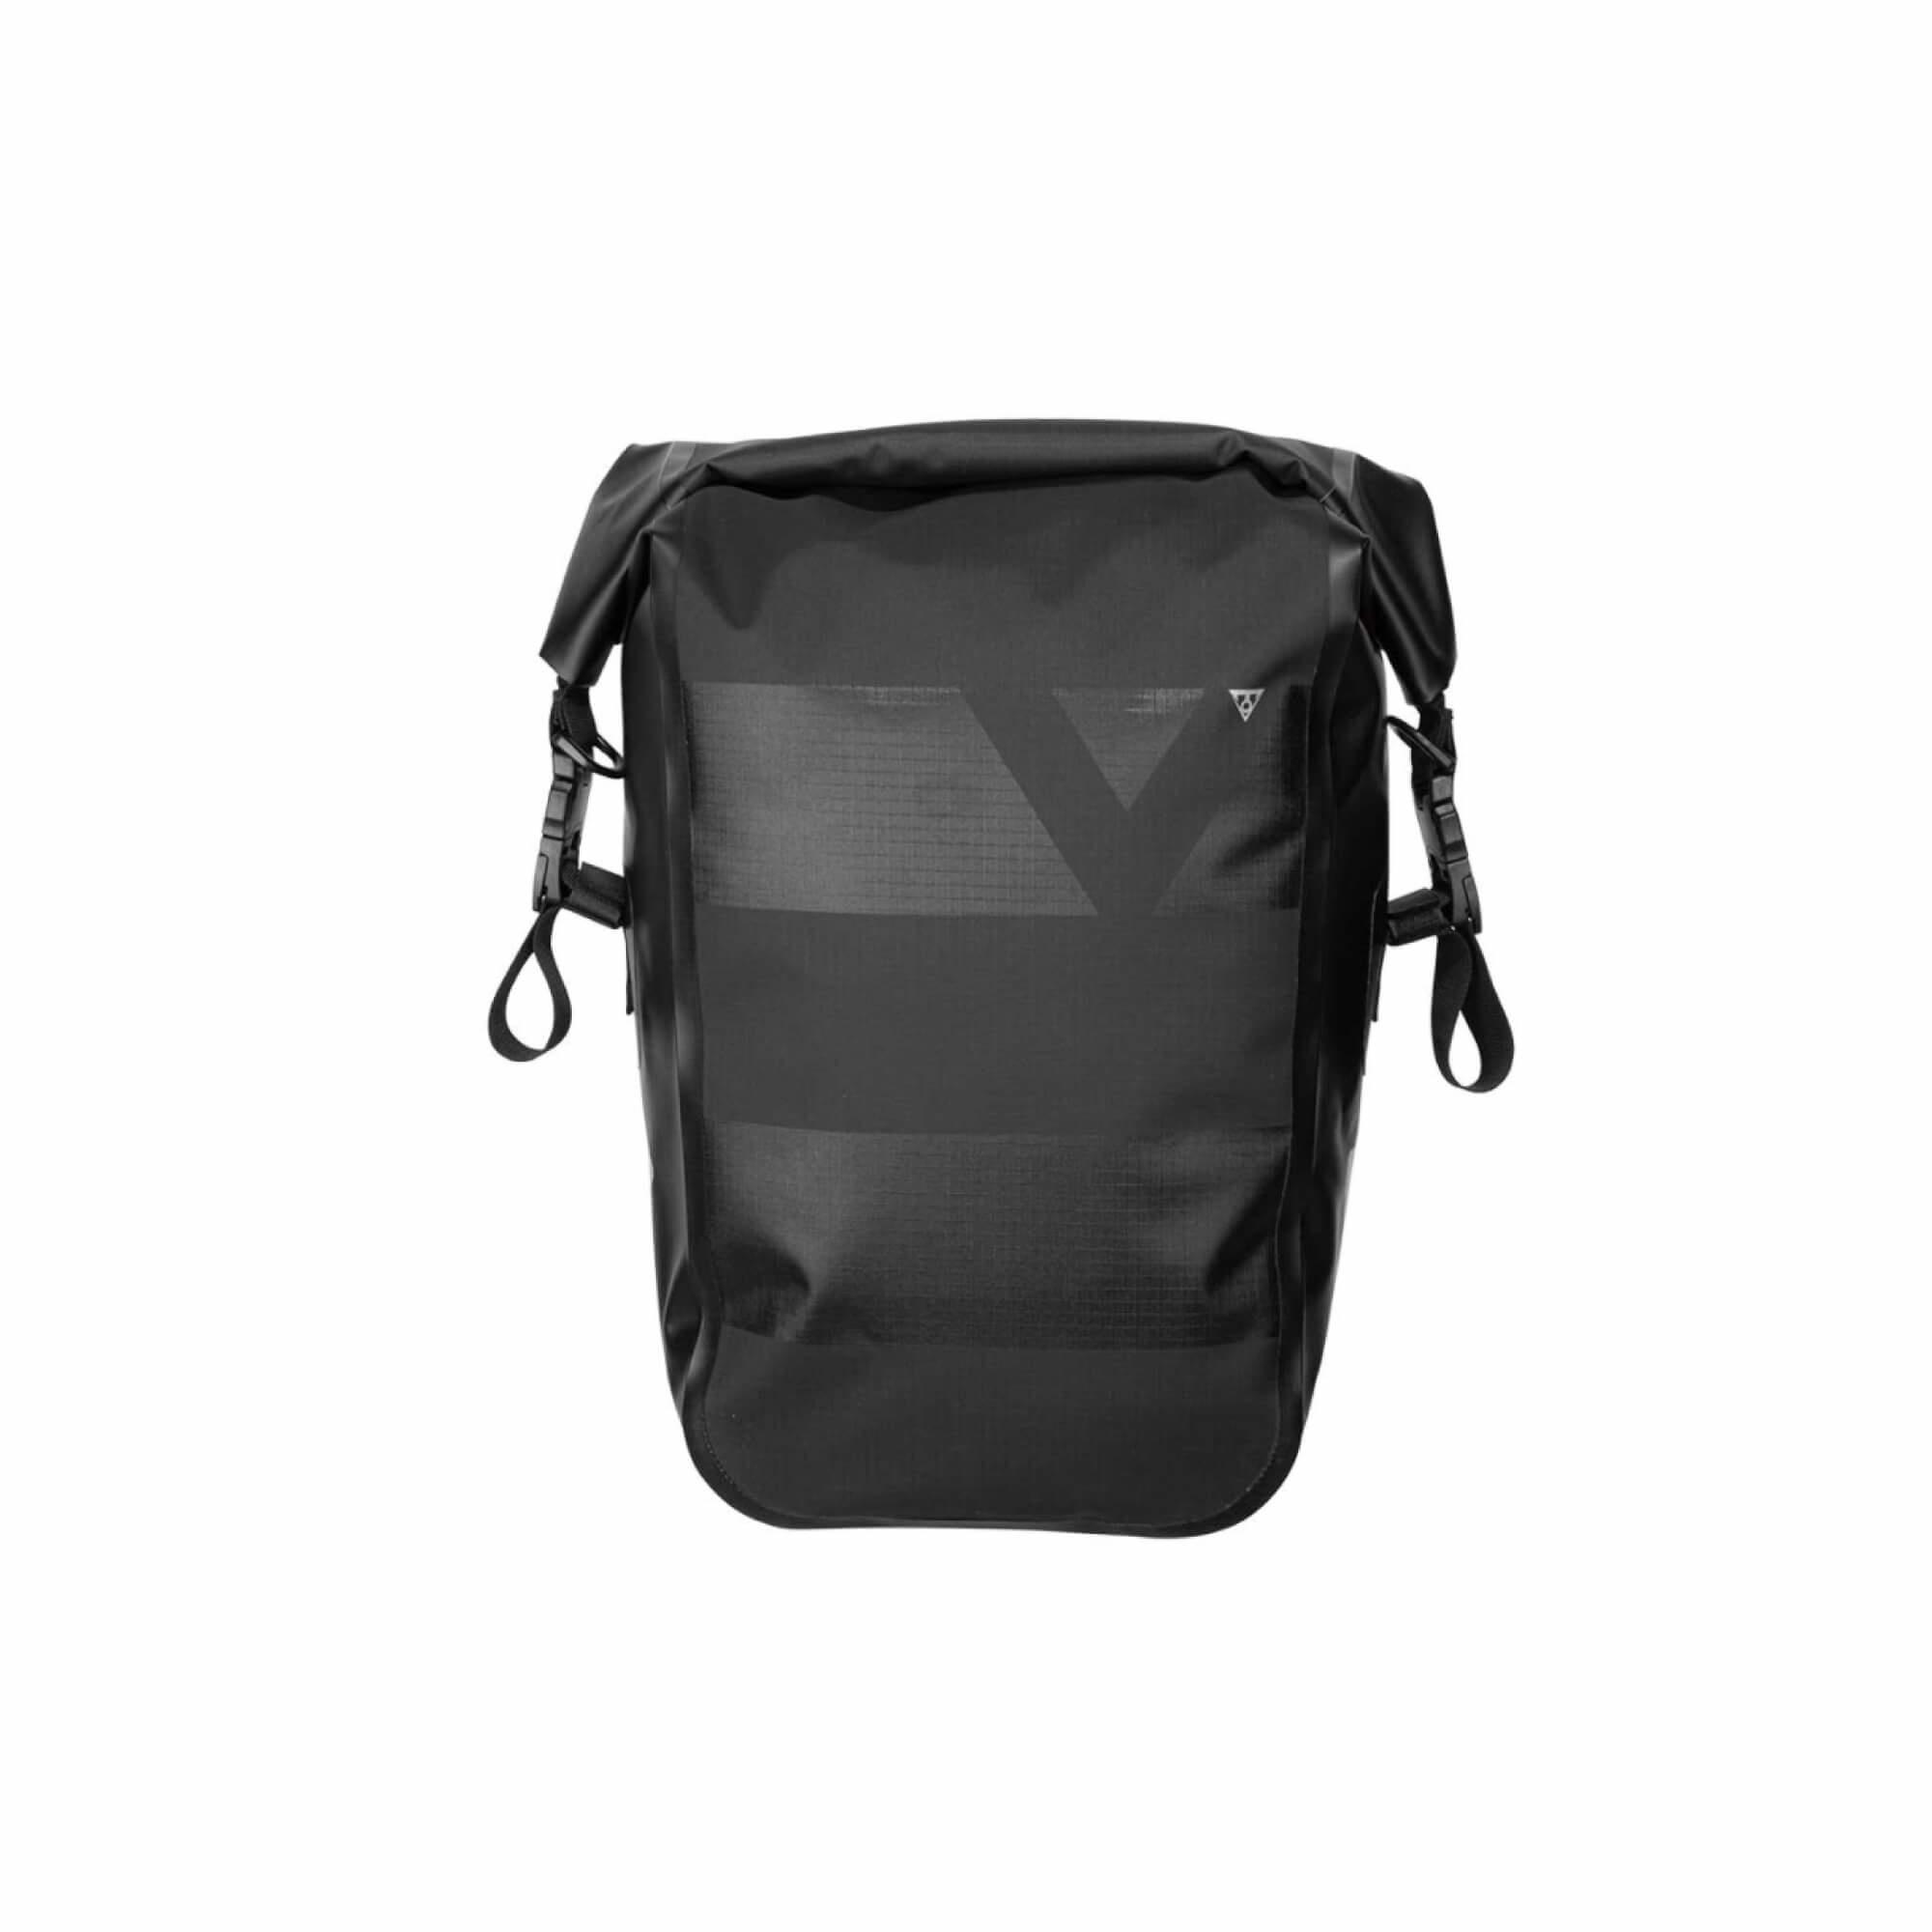 Pannier Drybag 15L One Piece Black-2